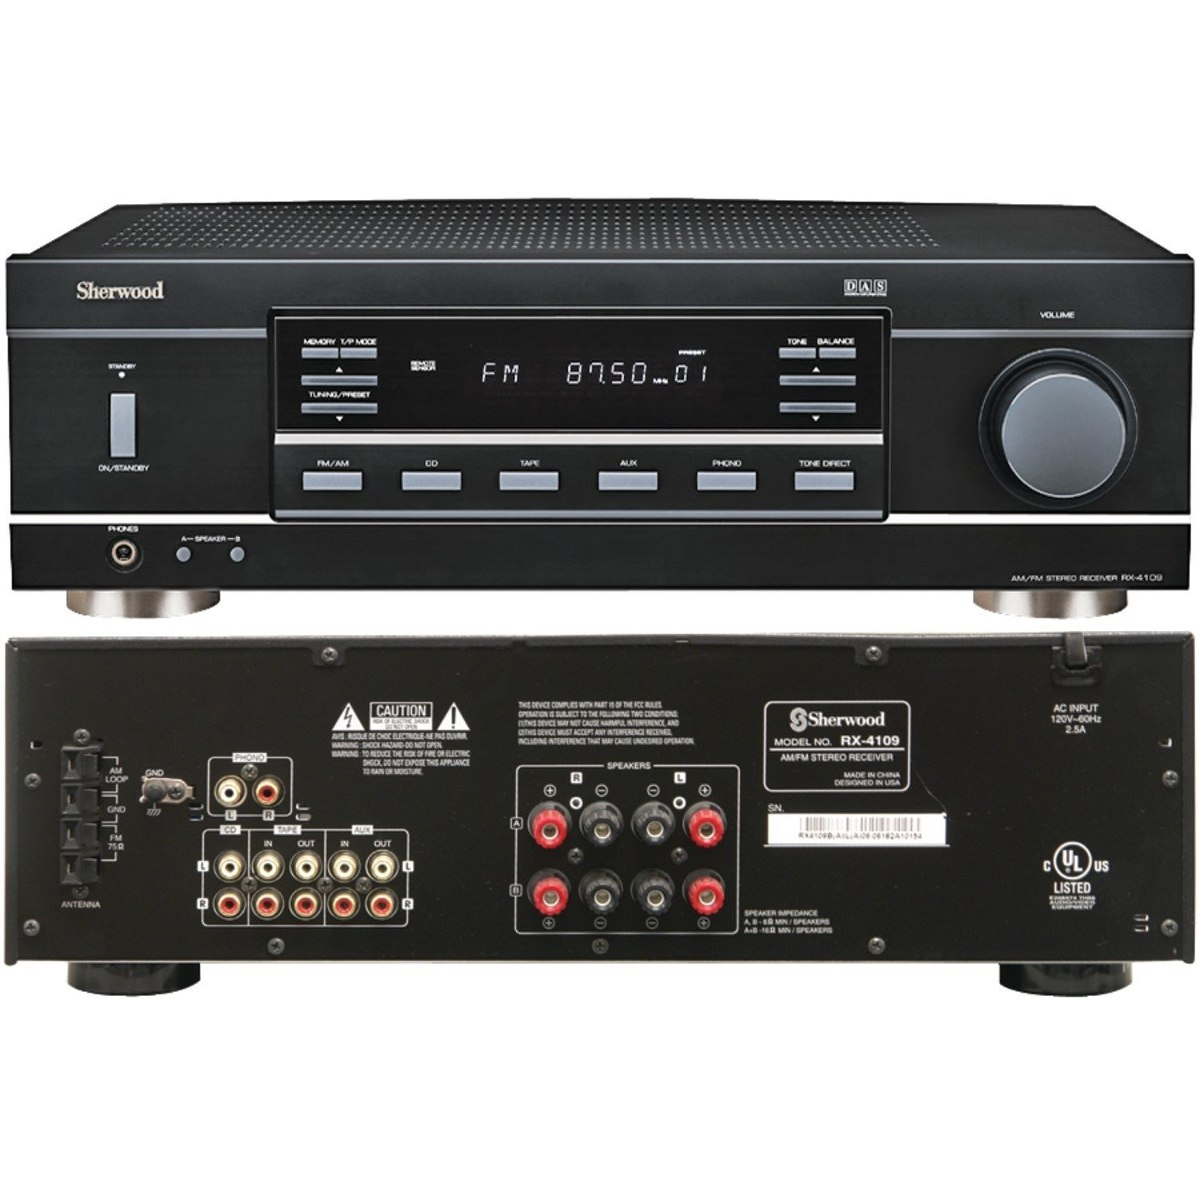 Amplificador sherwood rx 4109 receptor stereo 210 watts for Stereo casa